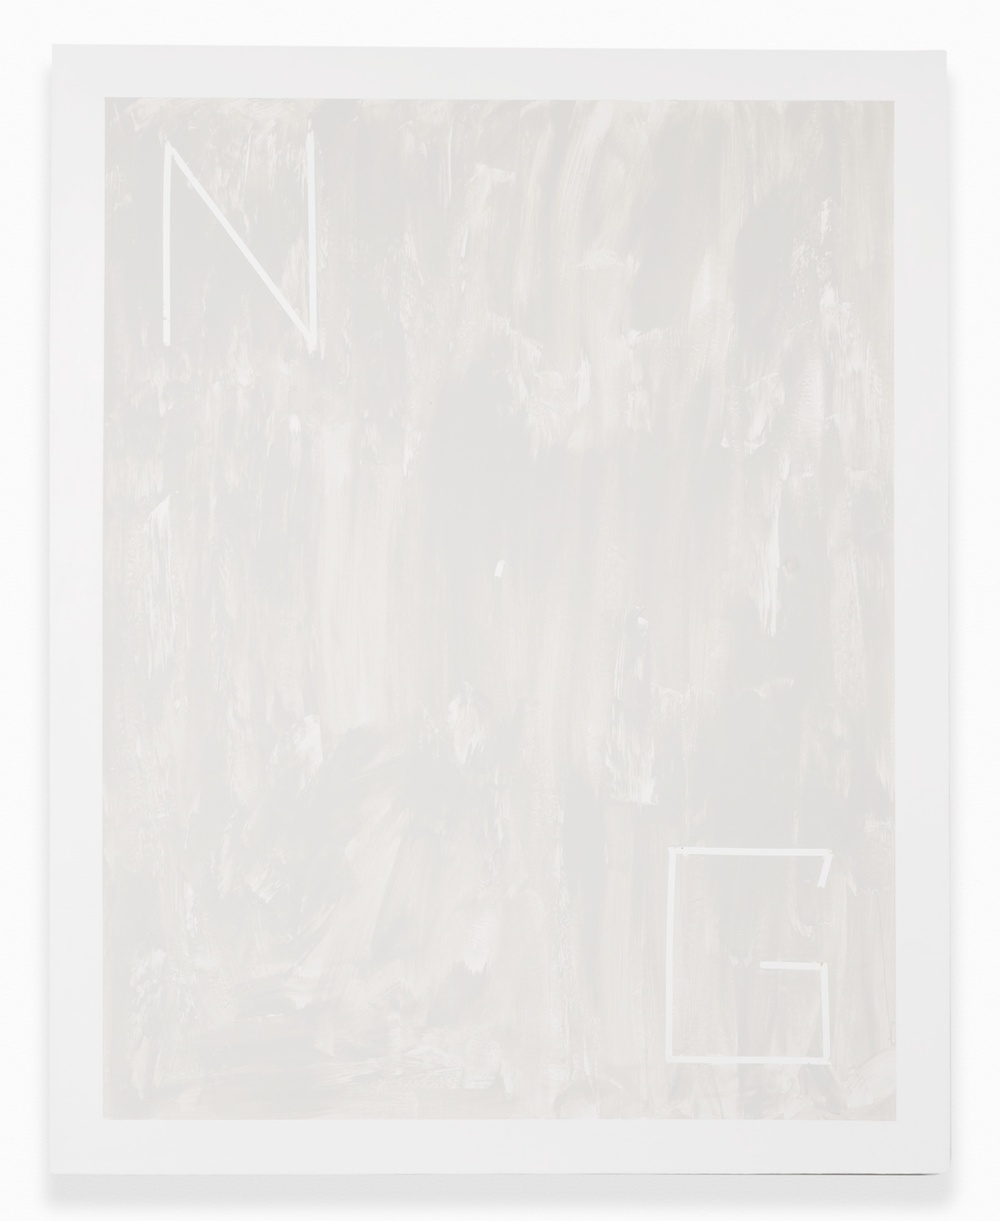 Shimon Minamikawa  Neutral Gray  2014 Acrylic on canvas 39 ½h x 31 ½w in SMin006